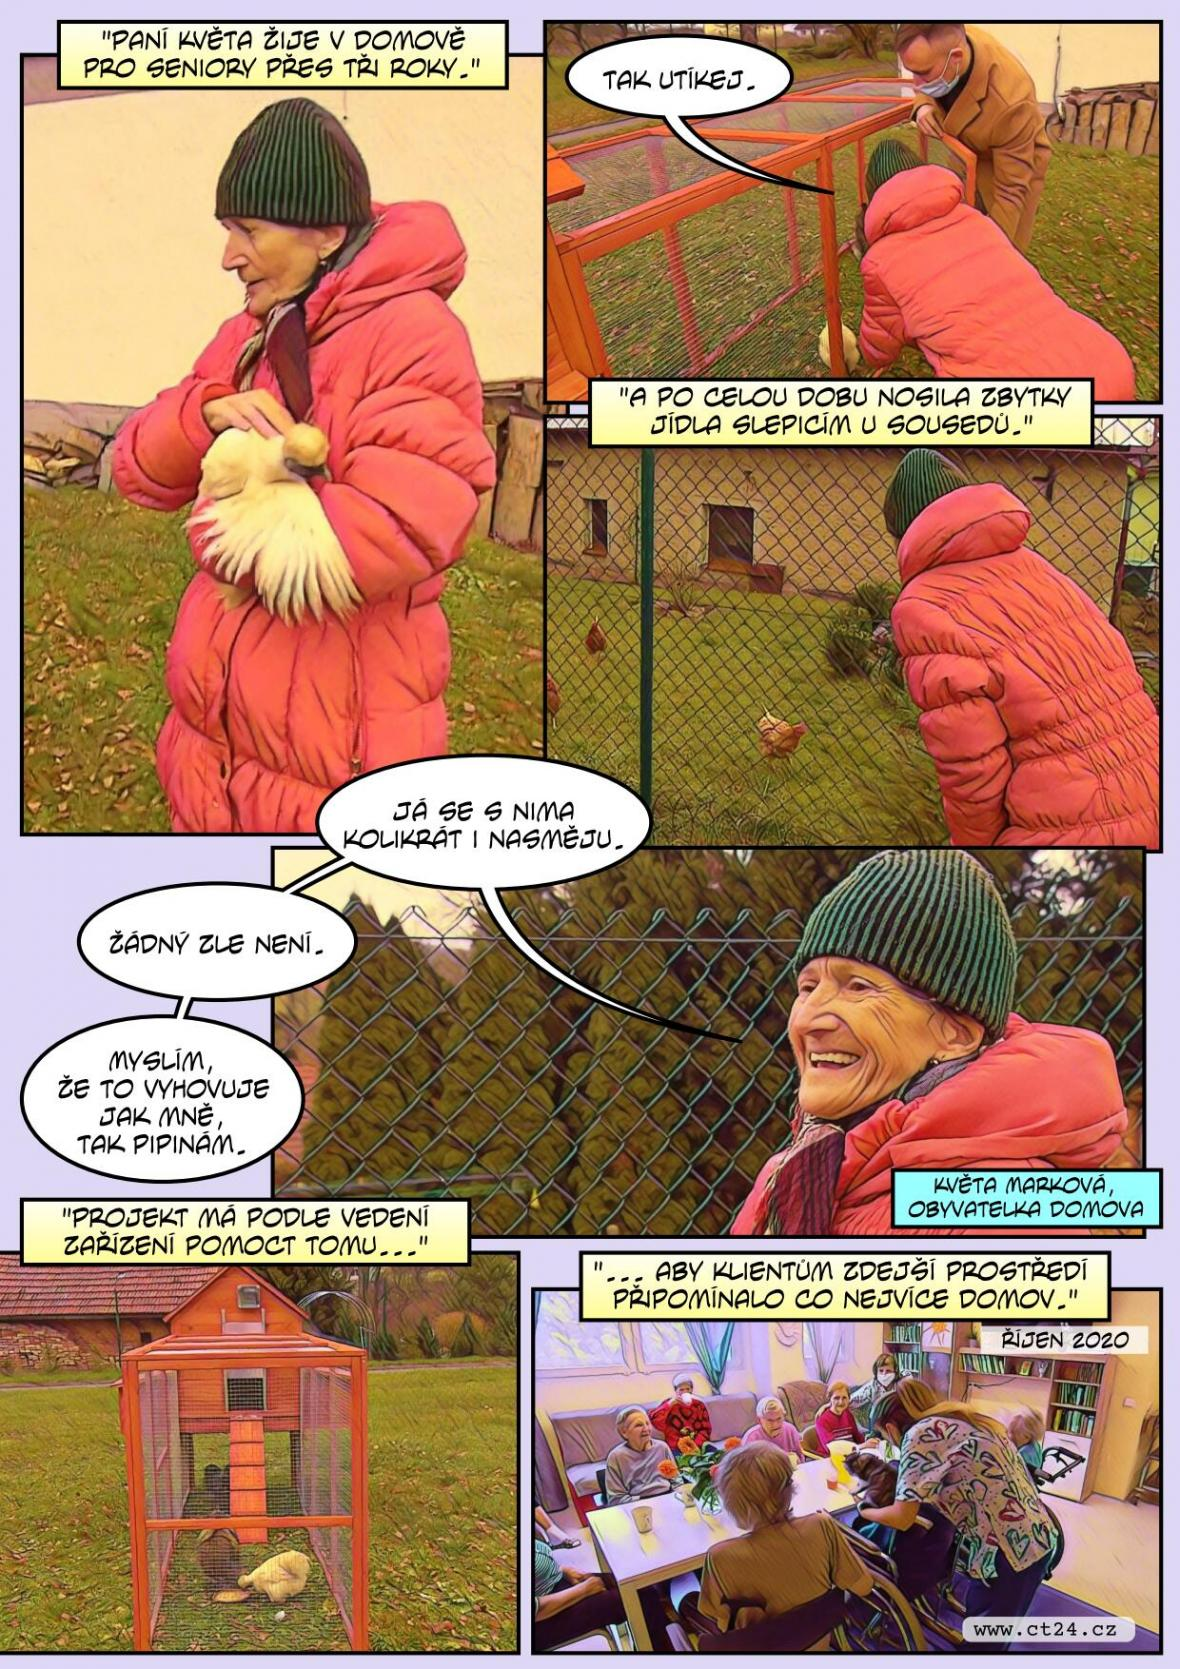 Terapeutické slepice pro seniory